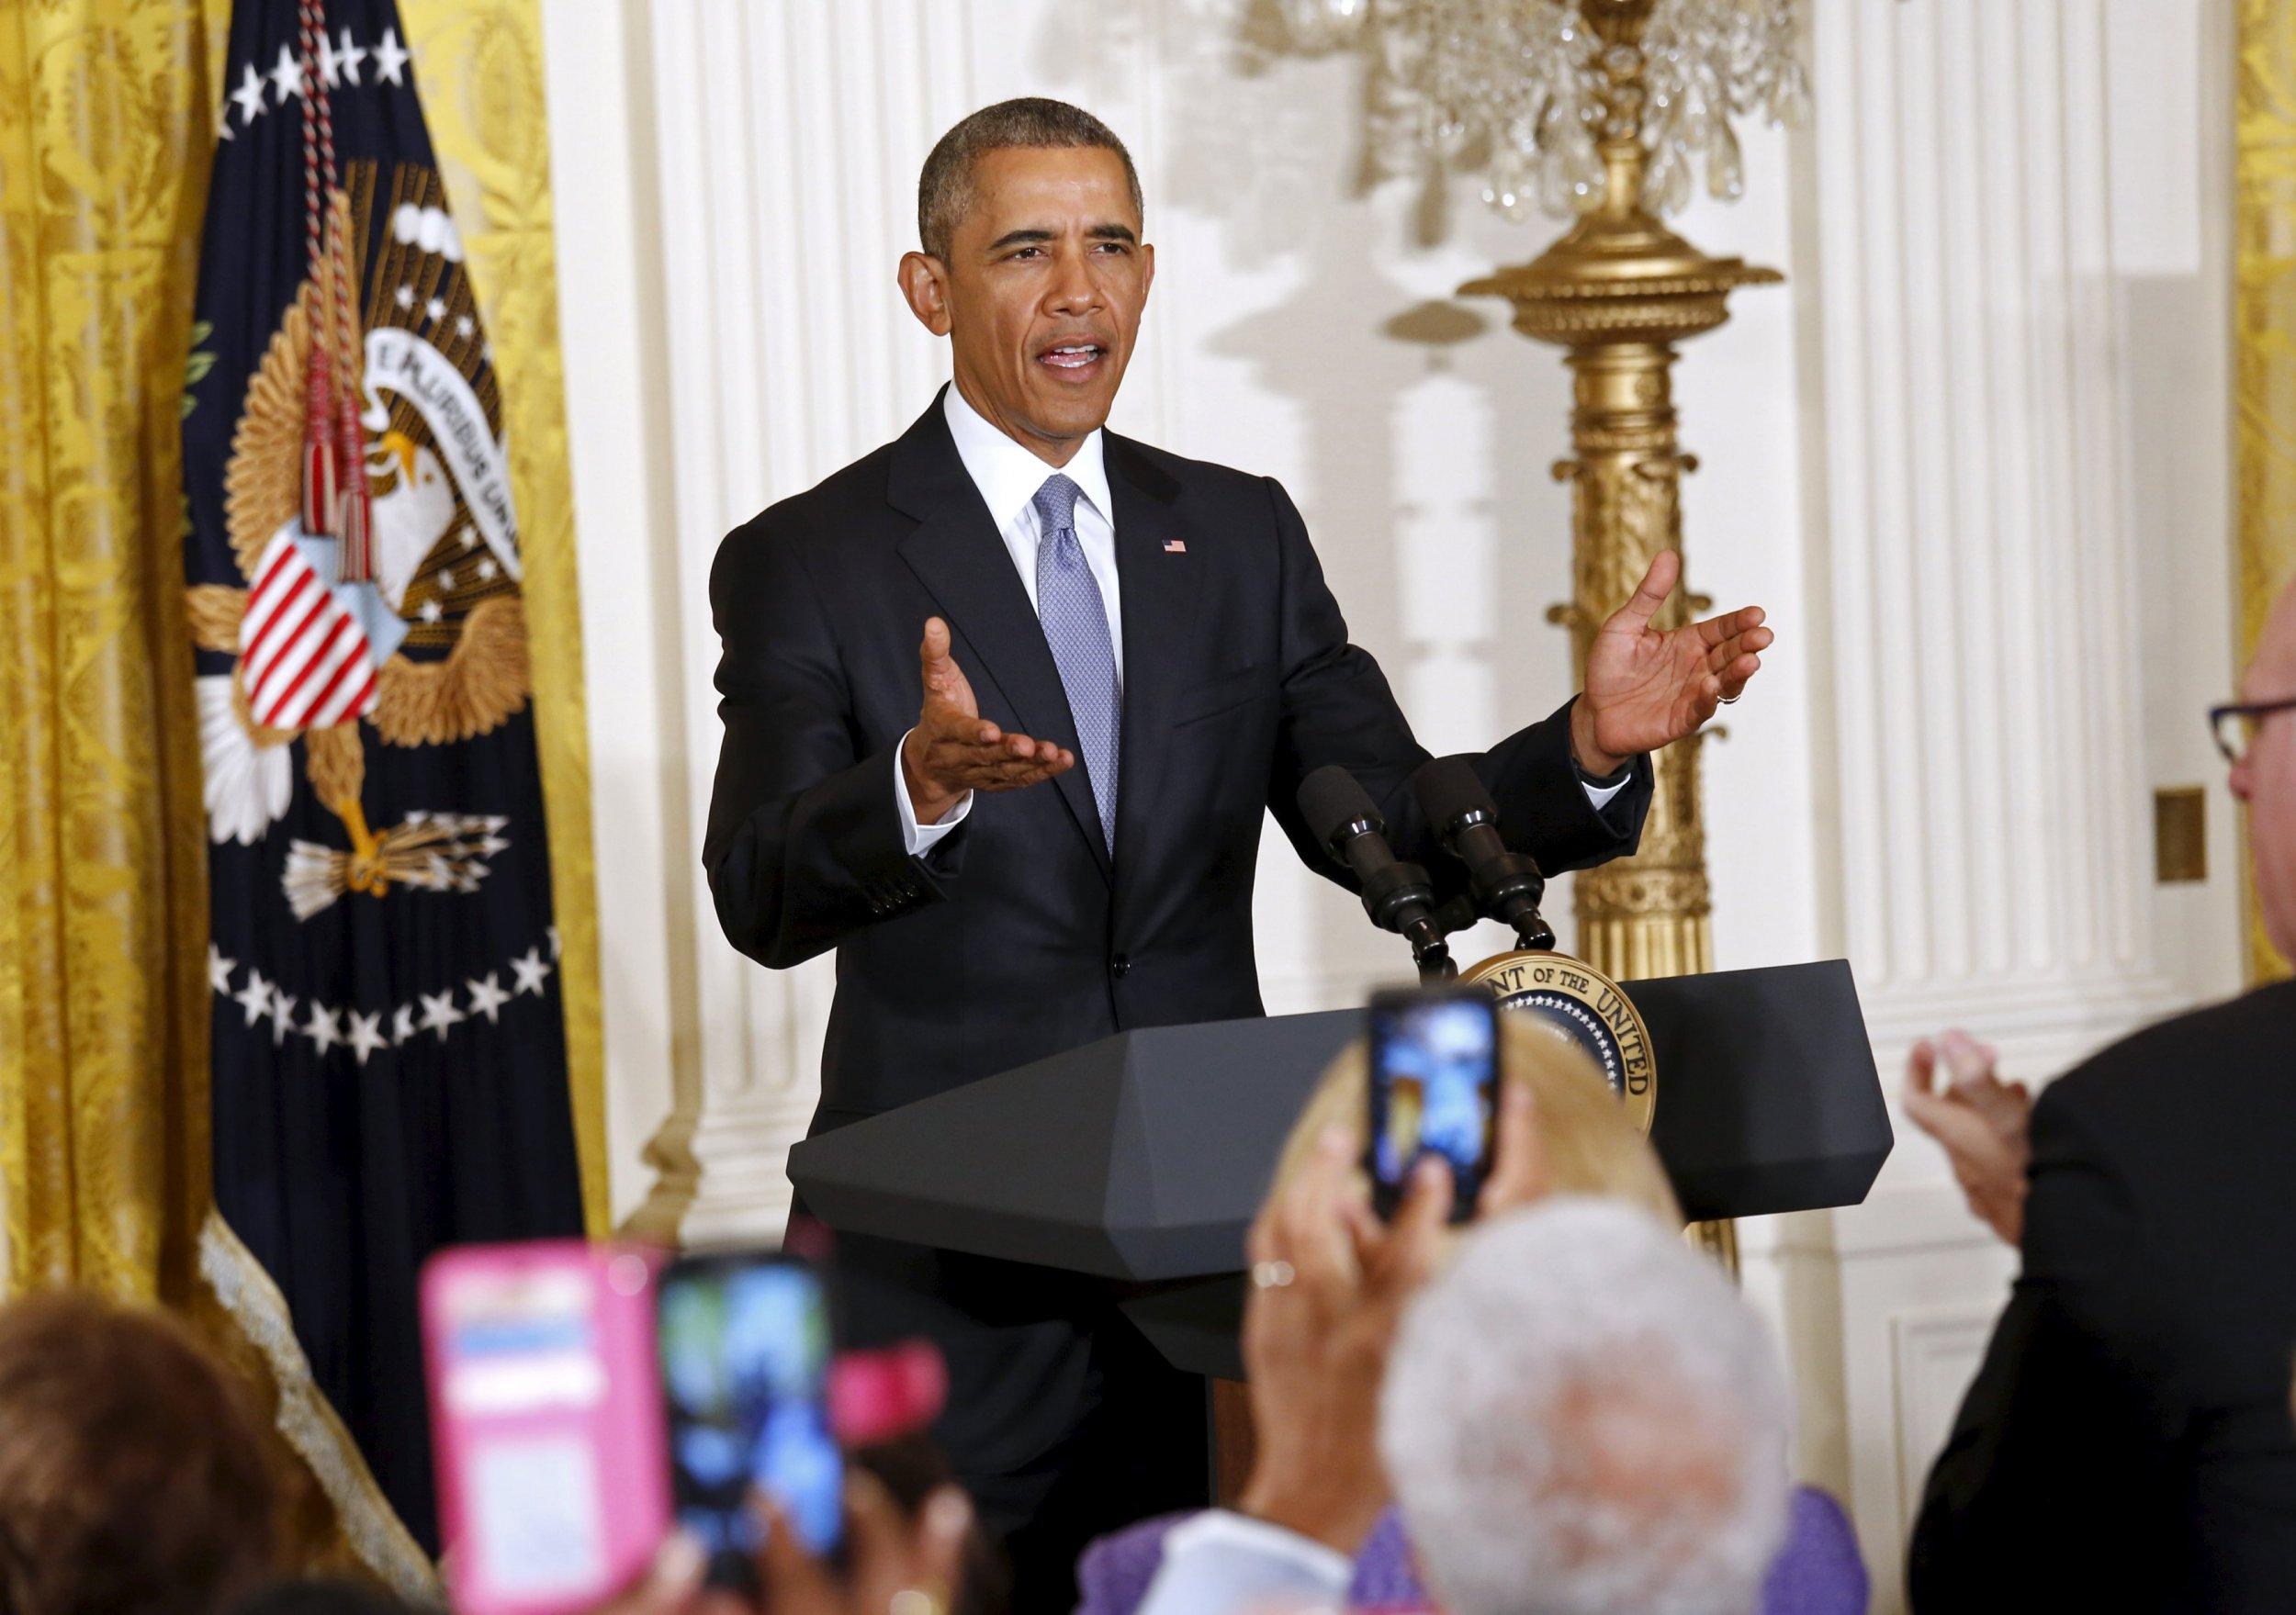 Obama commutes sentences of 46 prisoners